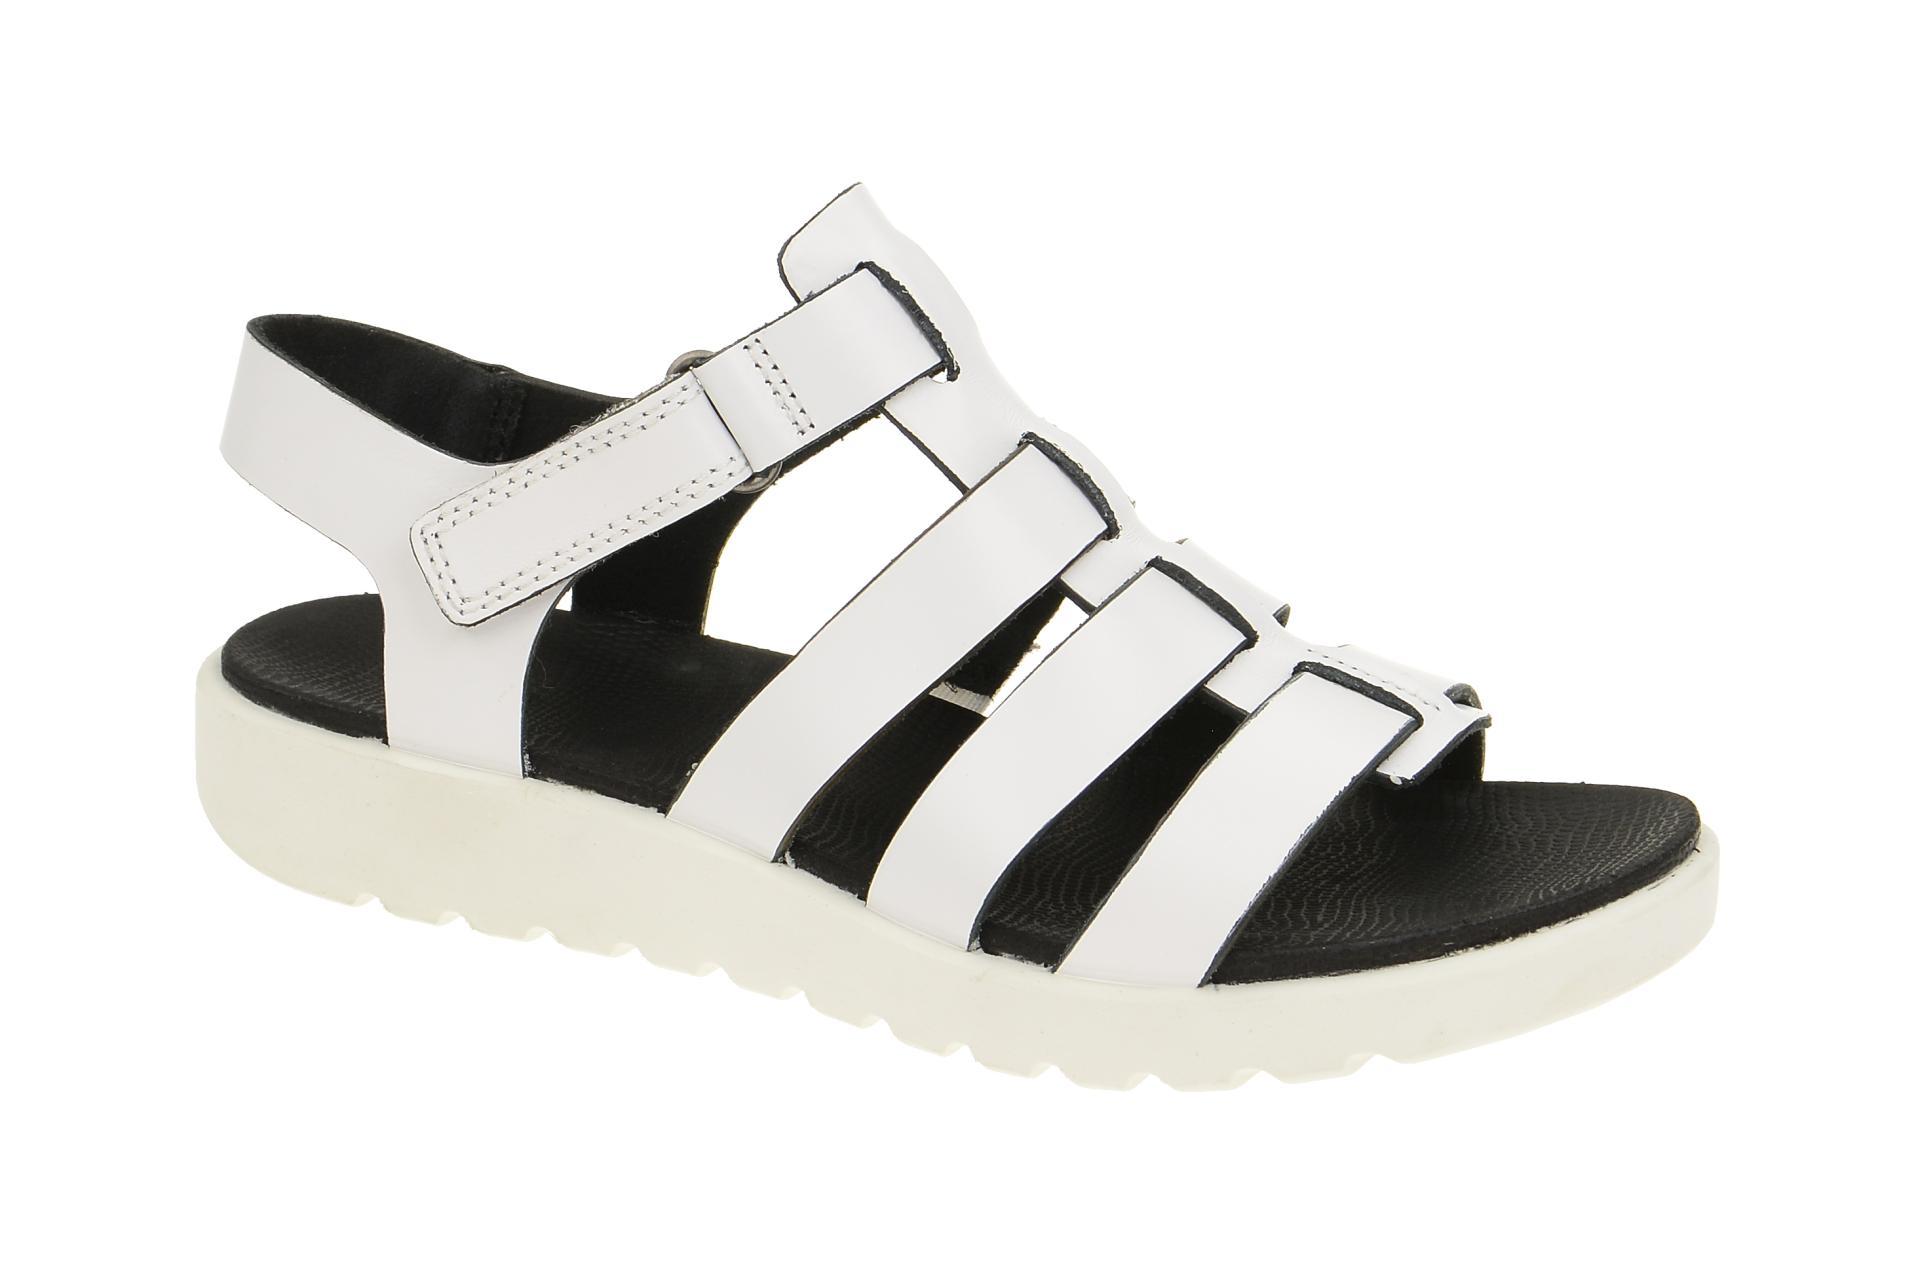 ecco damen sandalette riemchen sandalen freja wei white. Black Bedroom Furniture Sets. Home Design Ideas